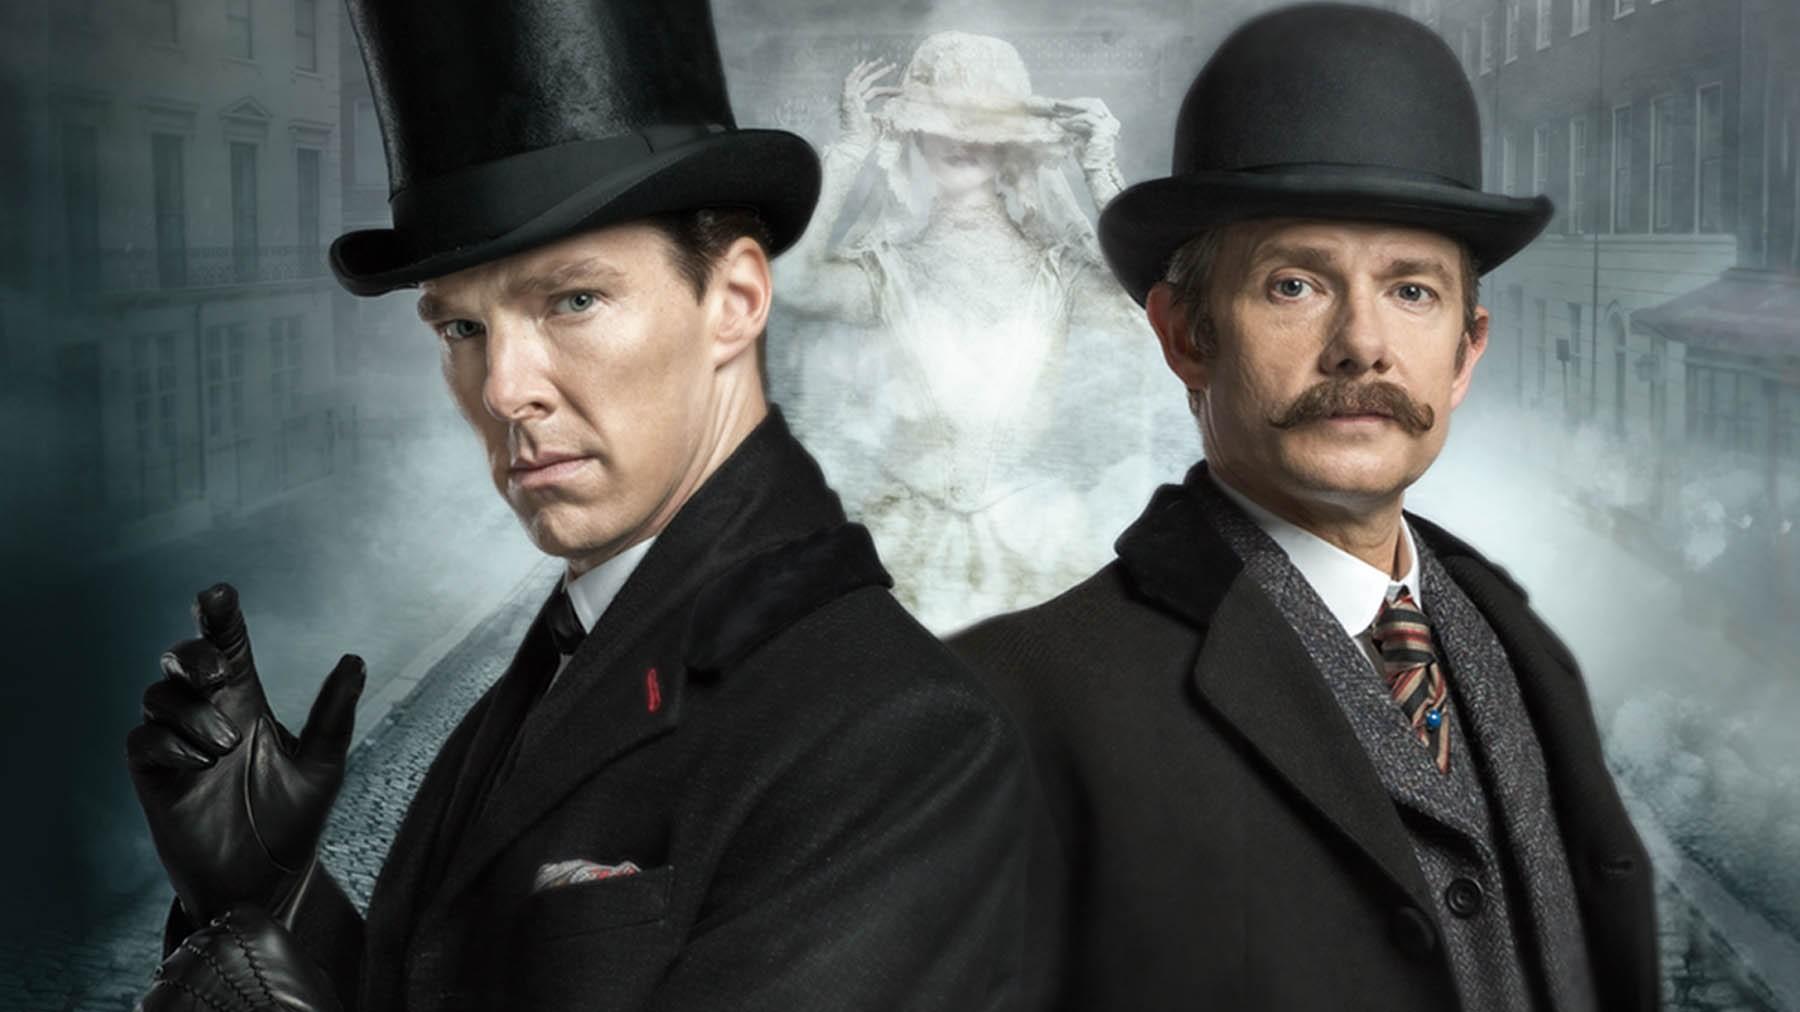 1st Look: 'Sherlock: The Abominable Bride' Trailer #3